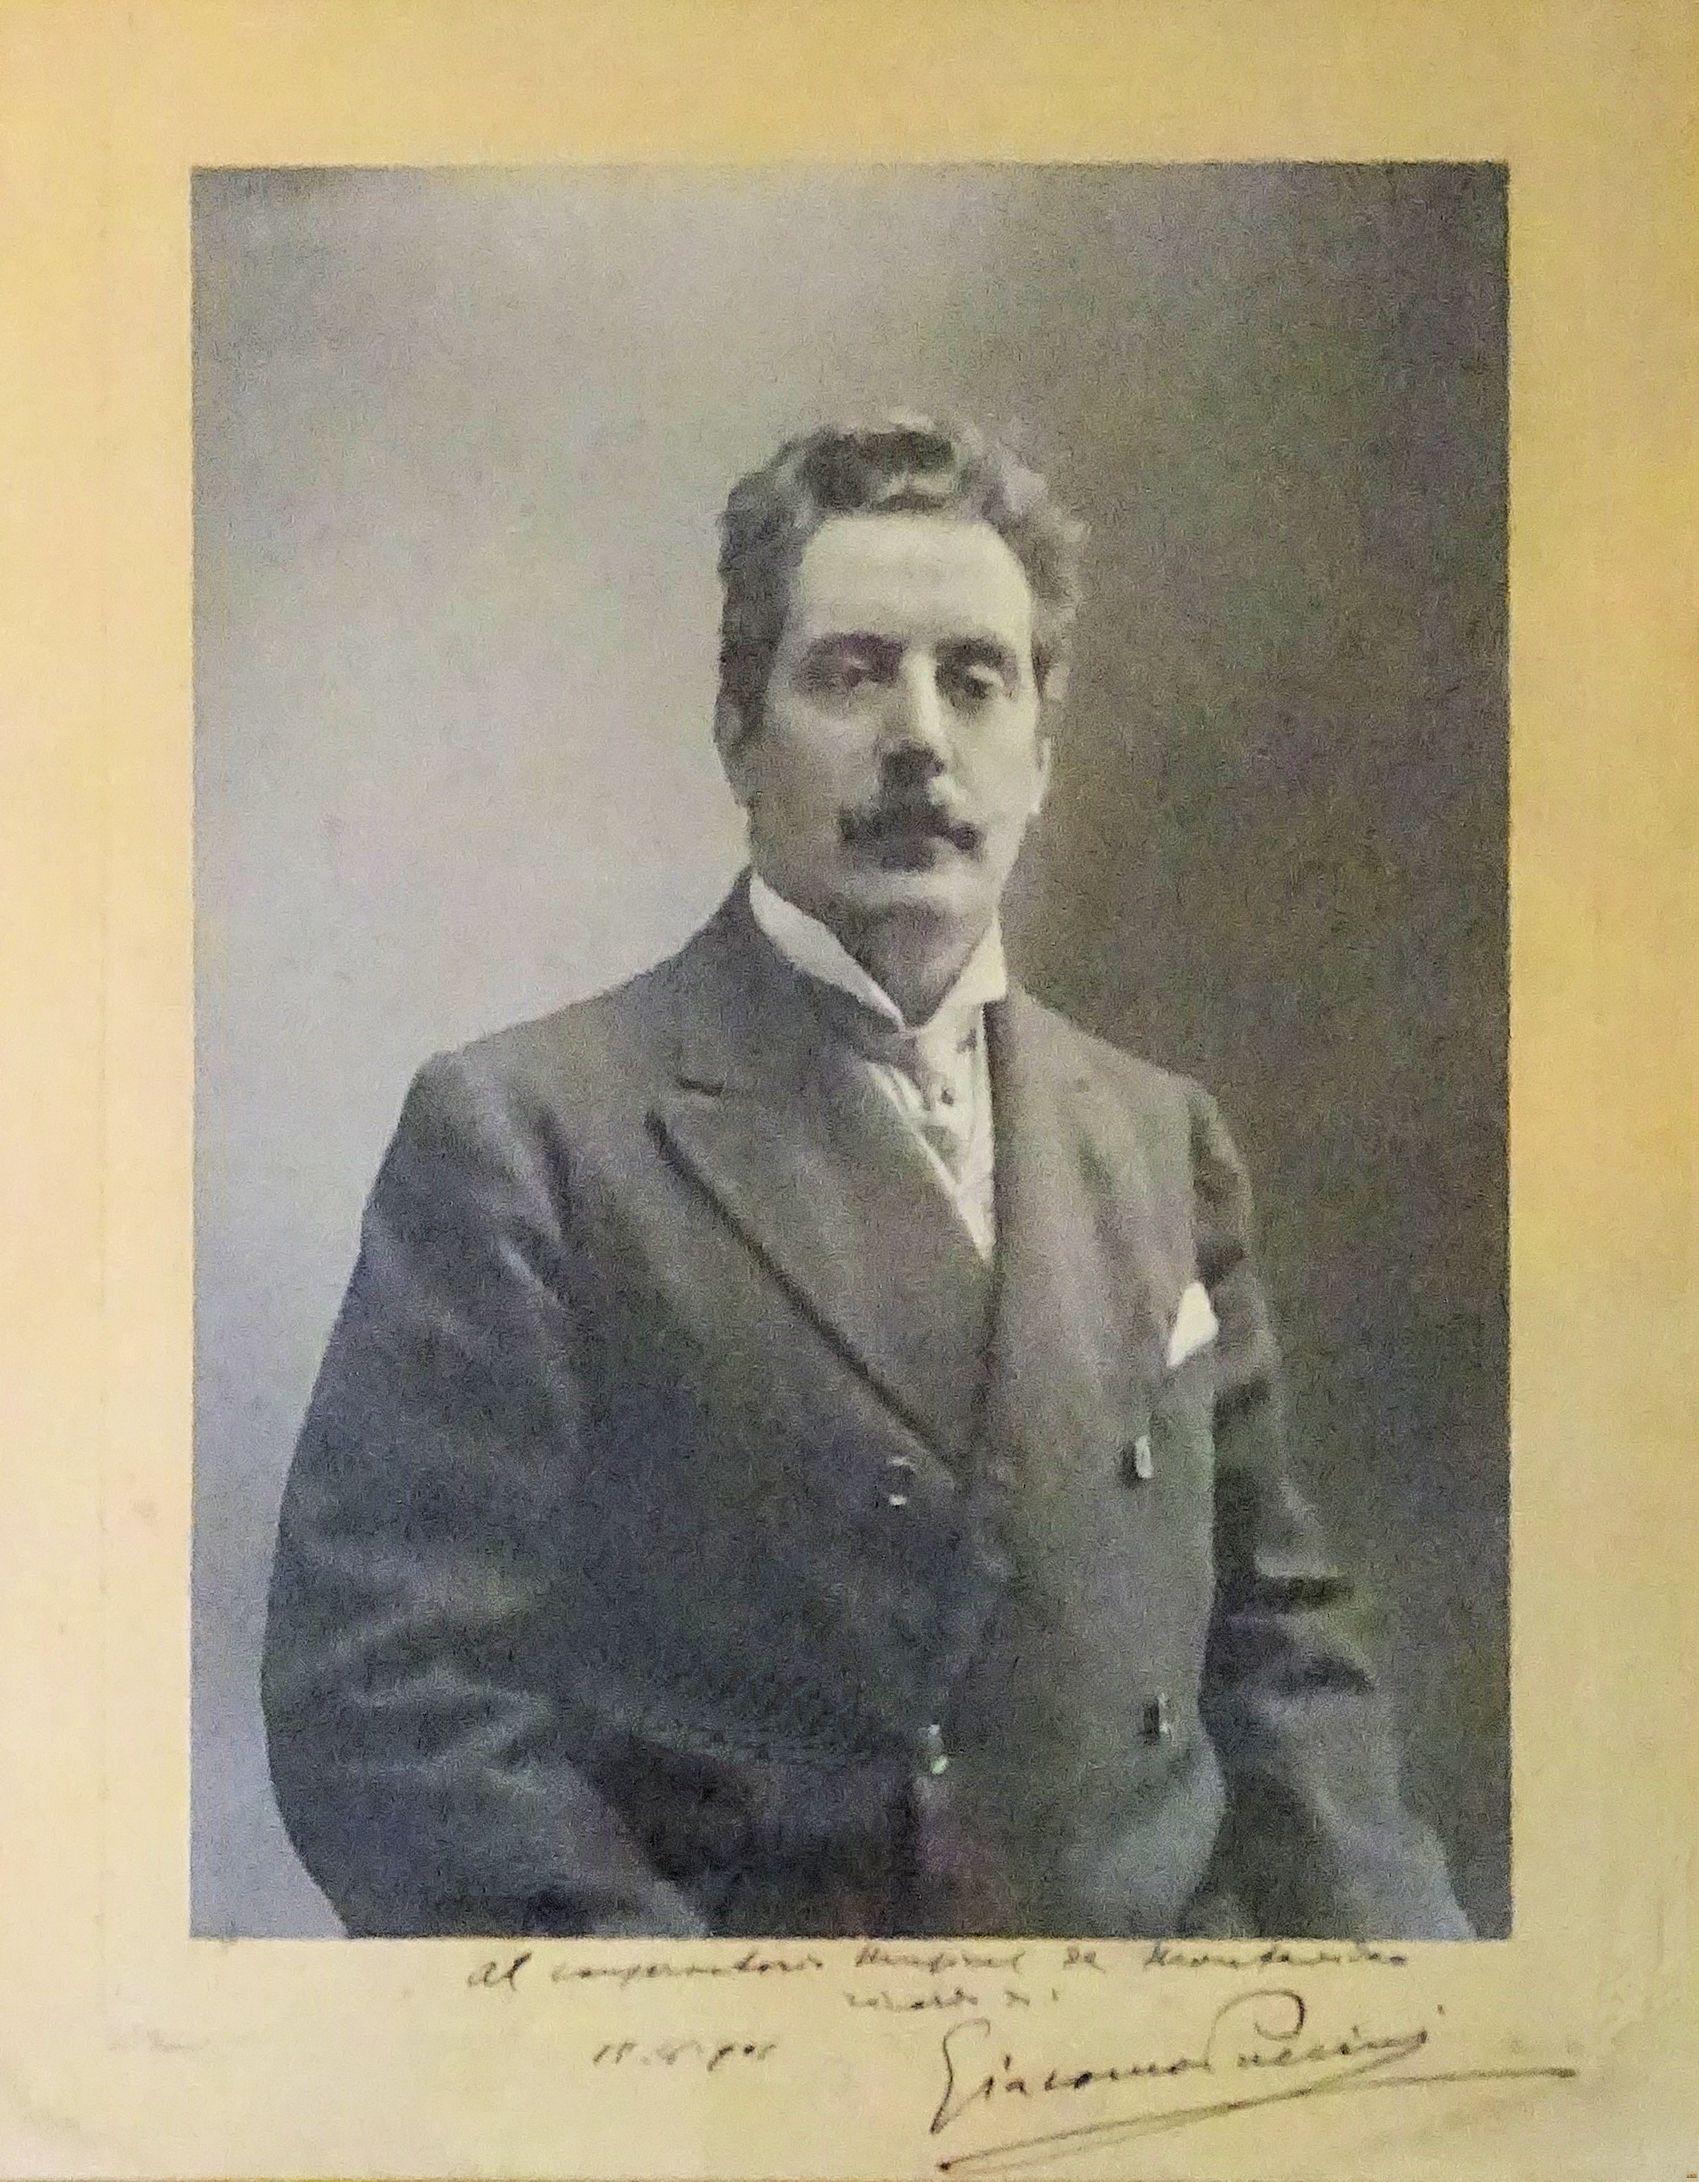 Giacomo Puccini (1858-1924), gigantic signed photo